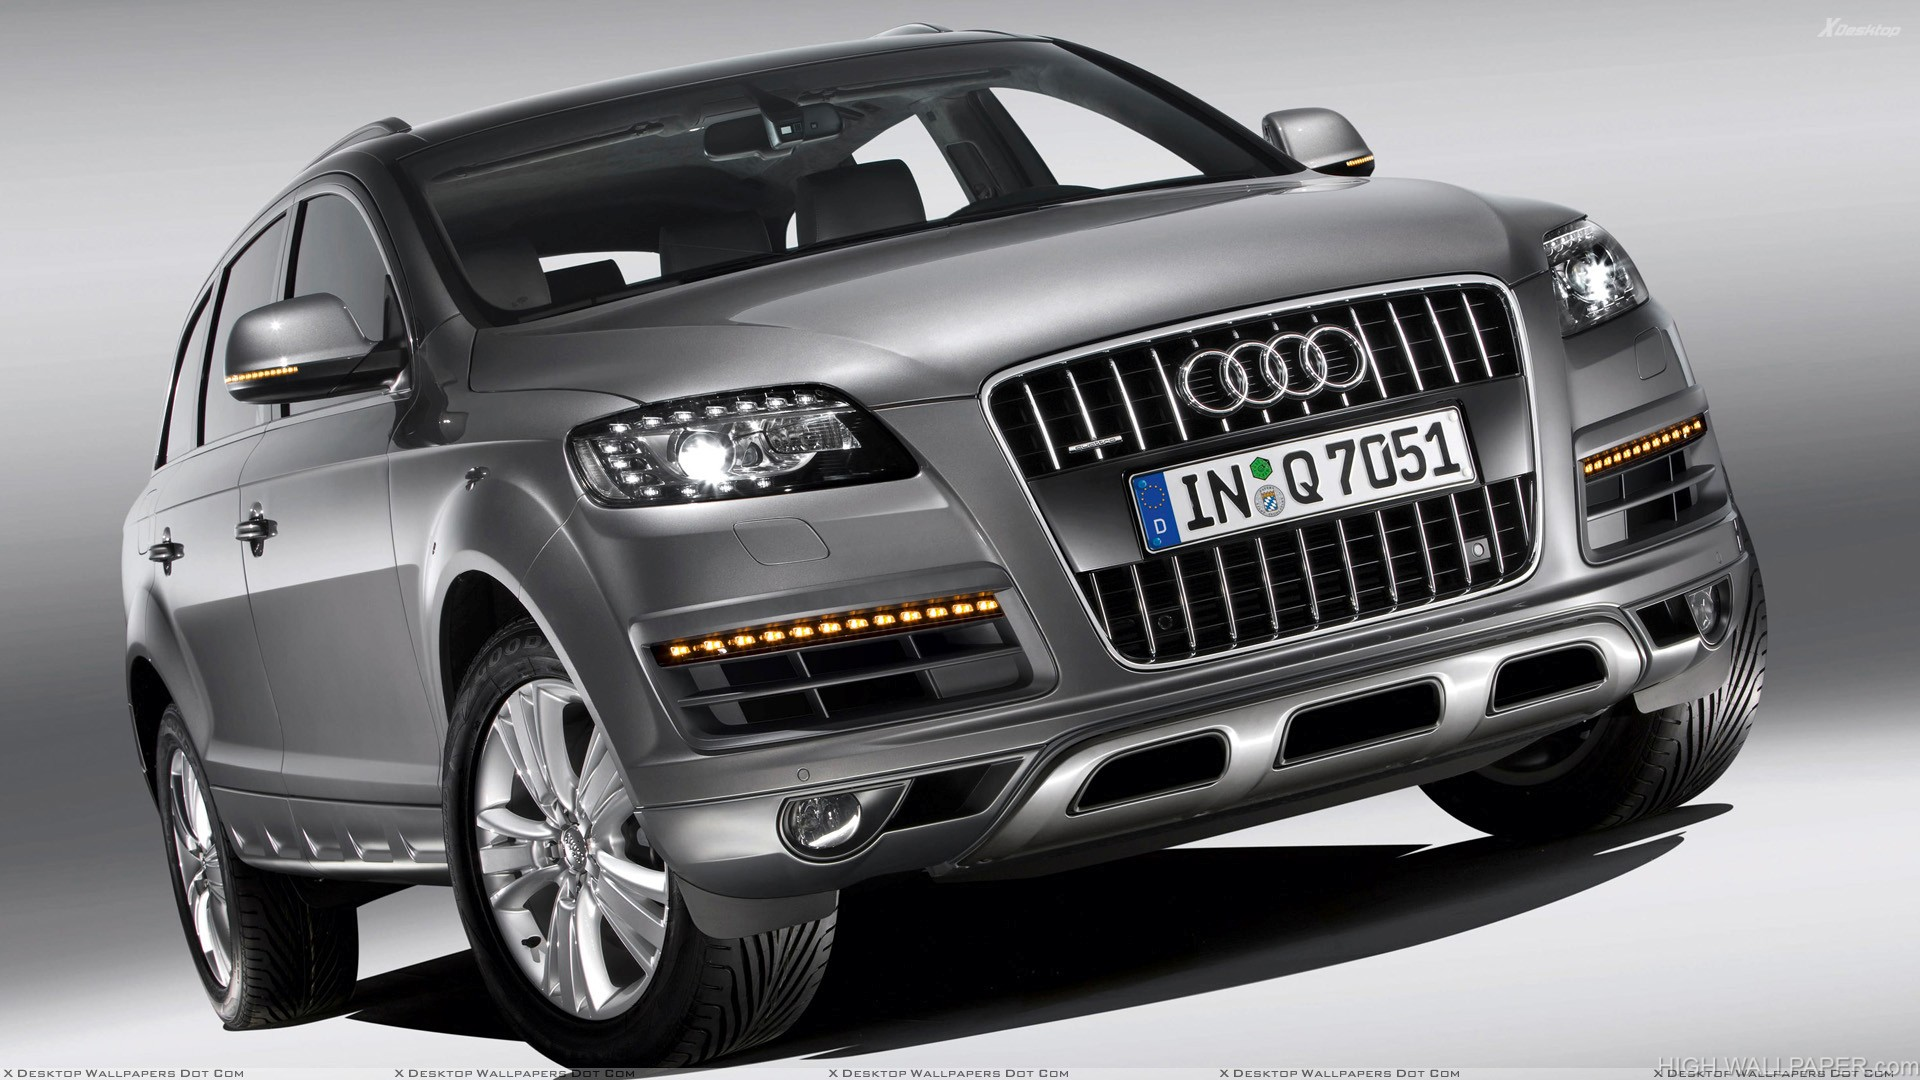 Front Pose of 2010 Audi Q7 30 TDI In Grey